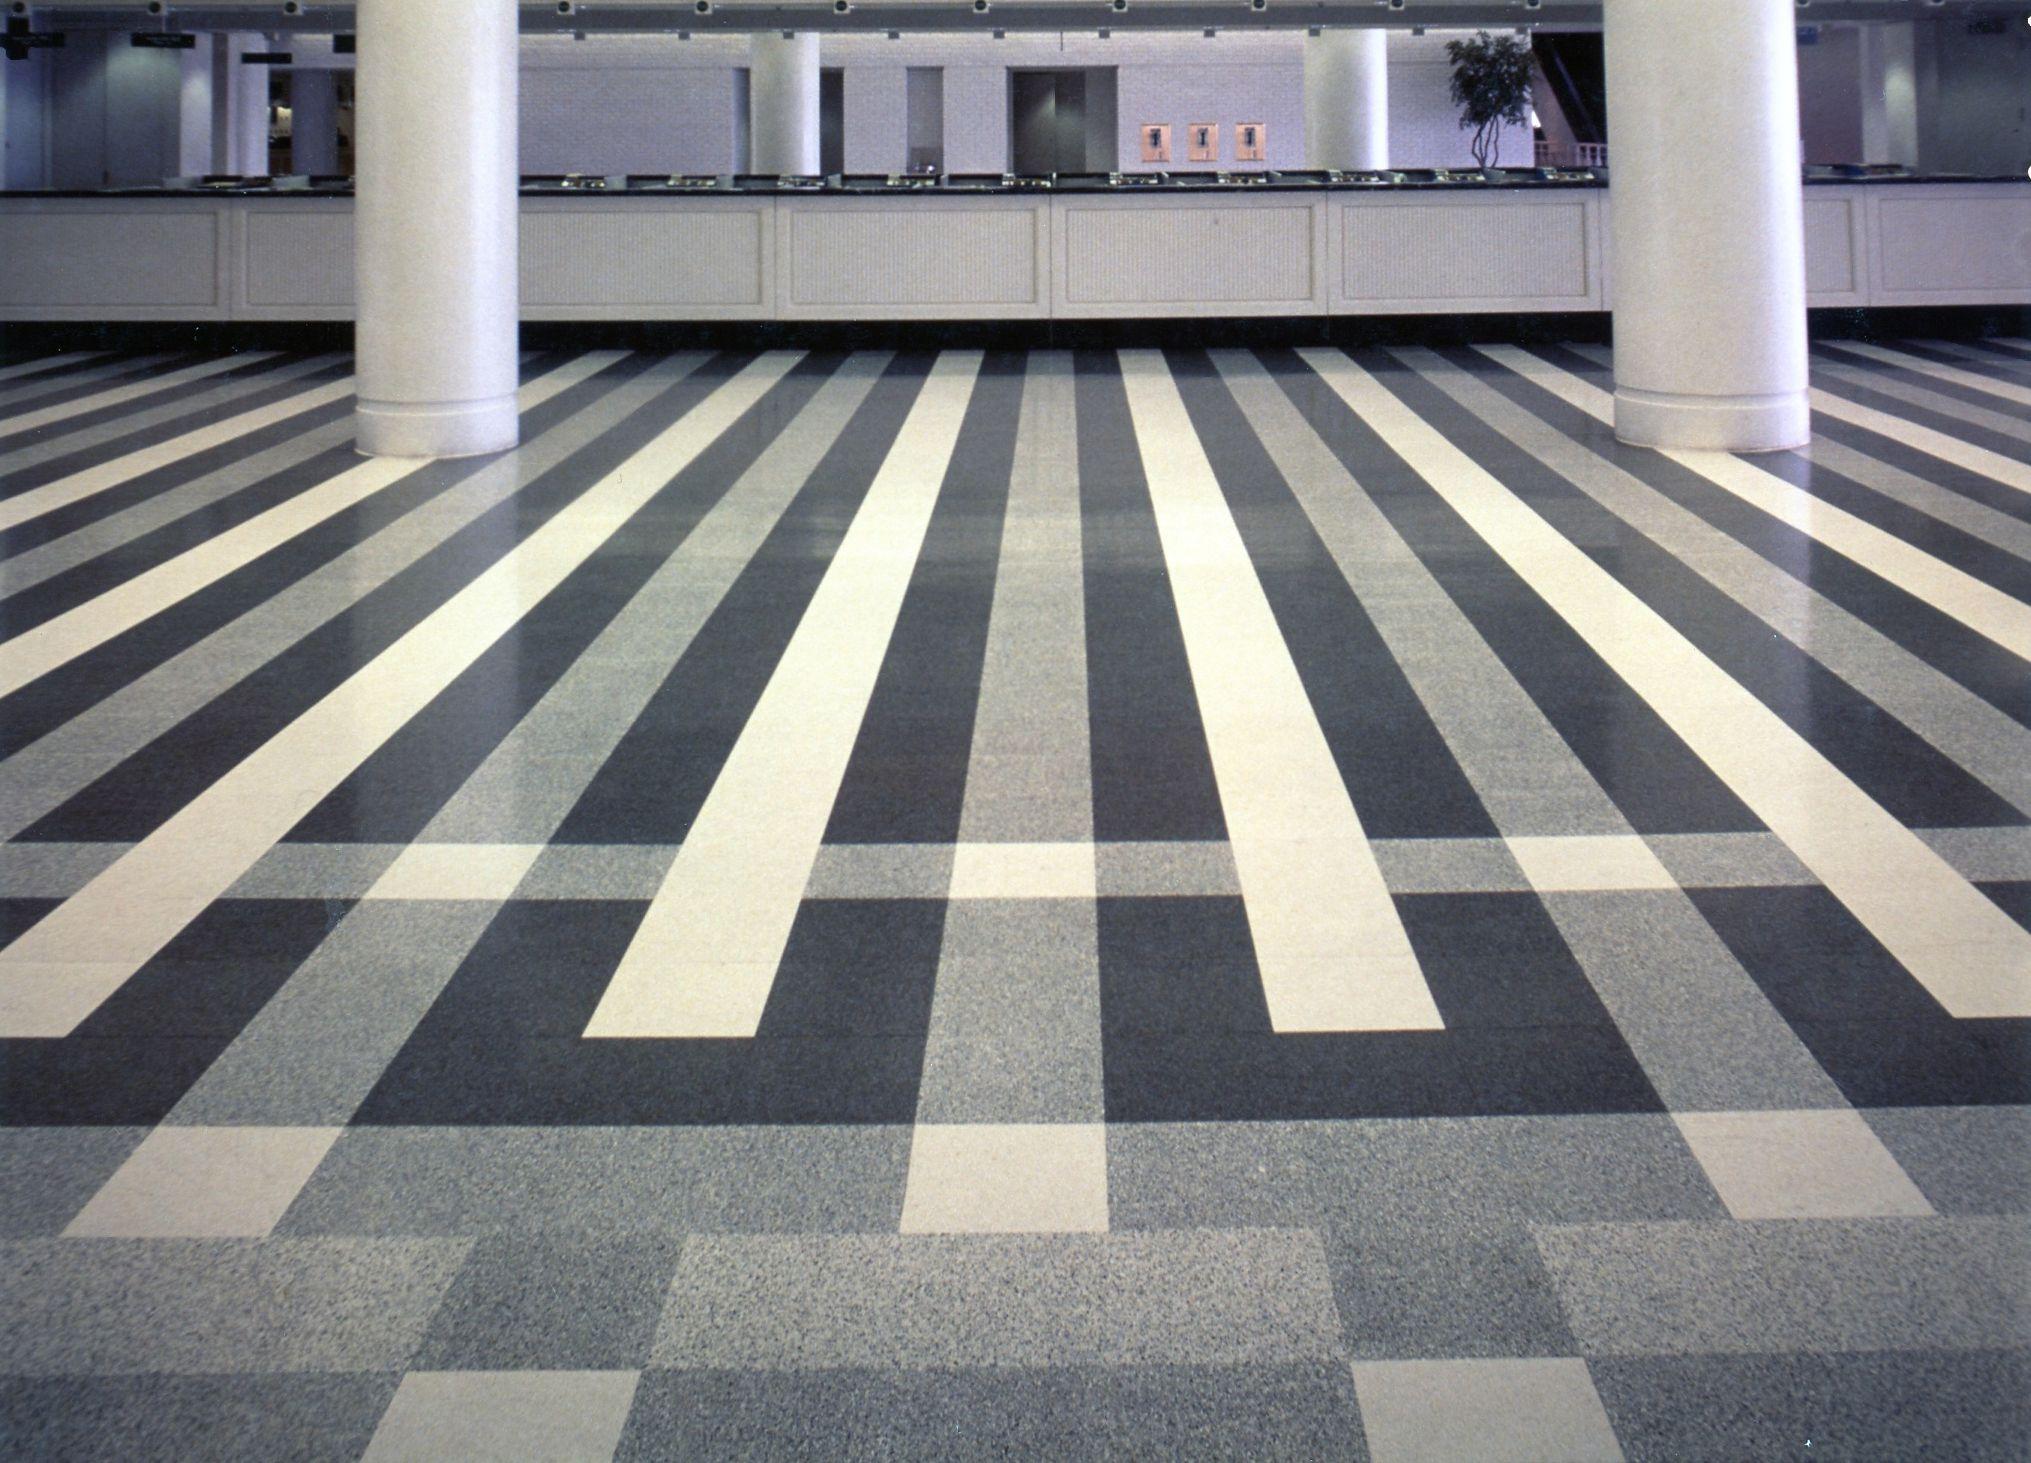 Fritztile terrazzo tile flooring cafeteria for High traffic flooring ideas